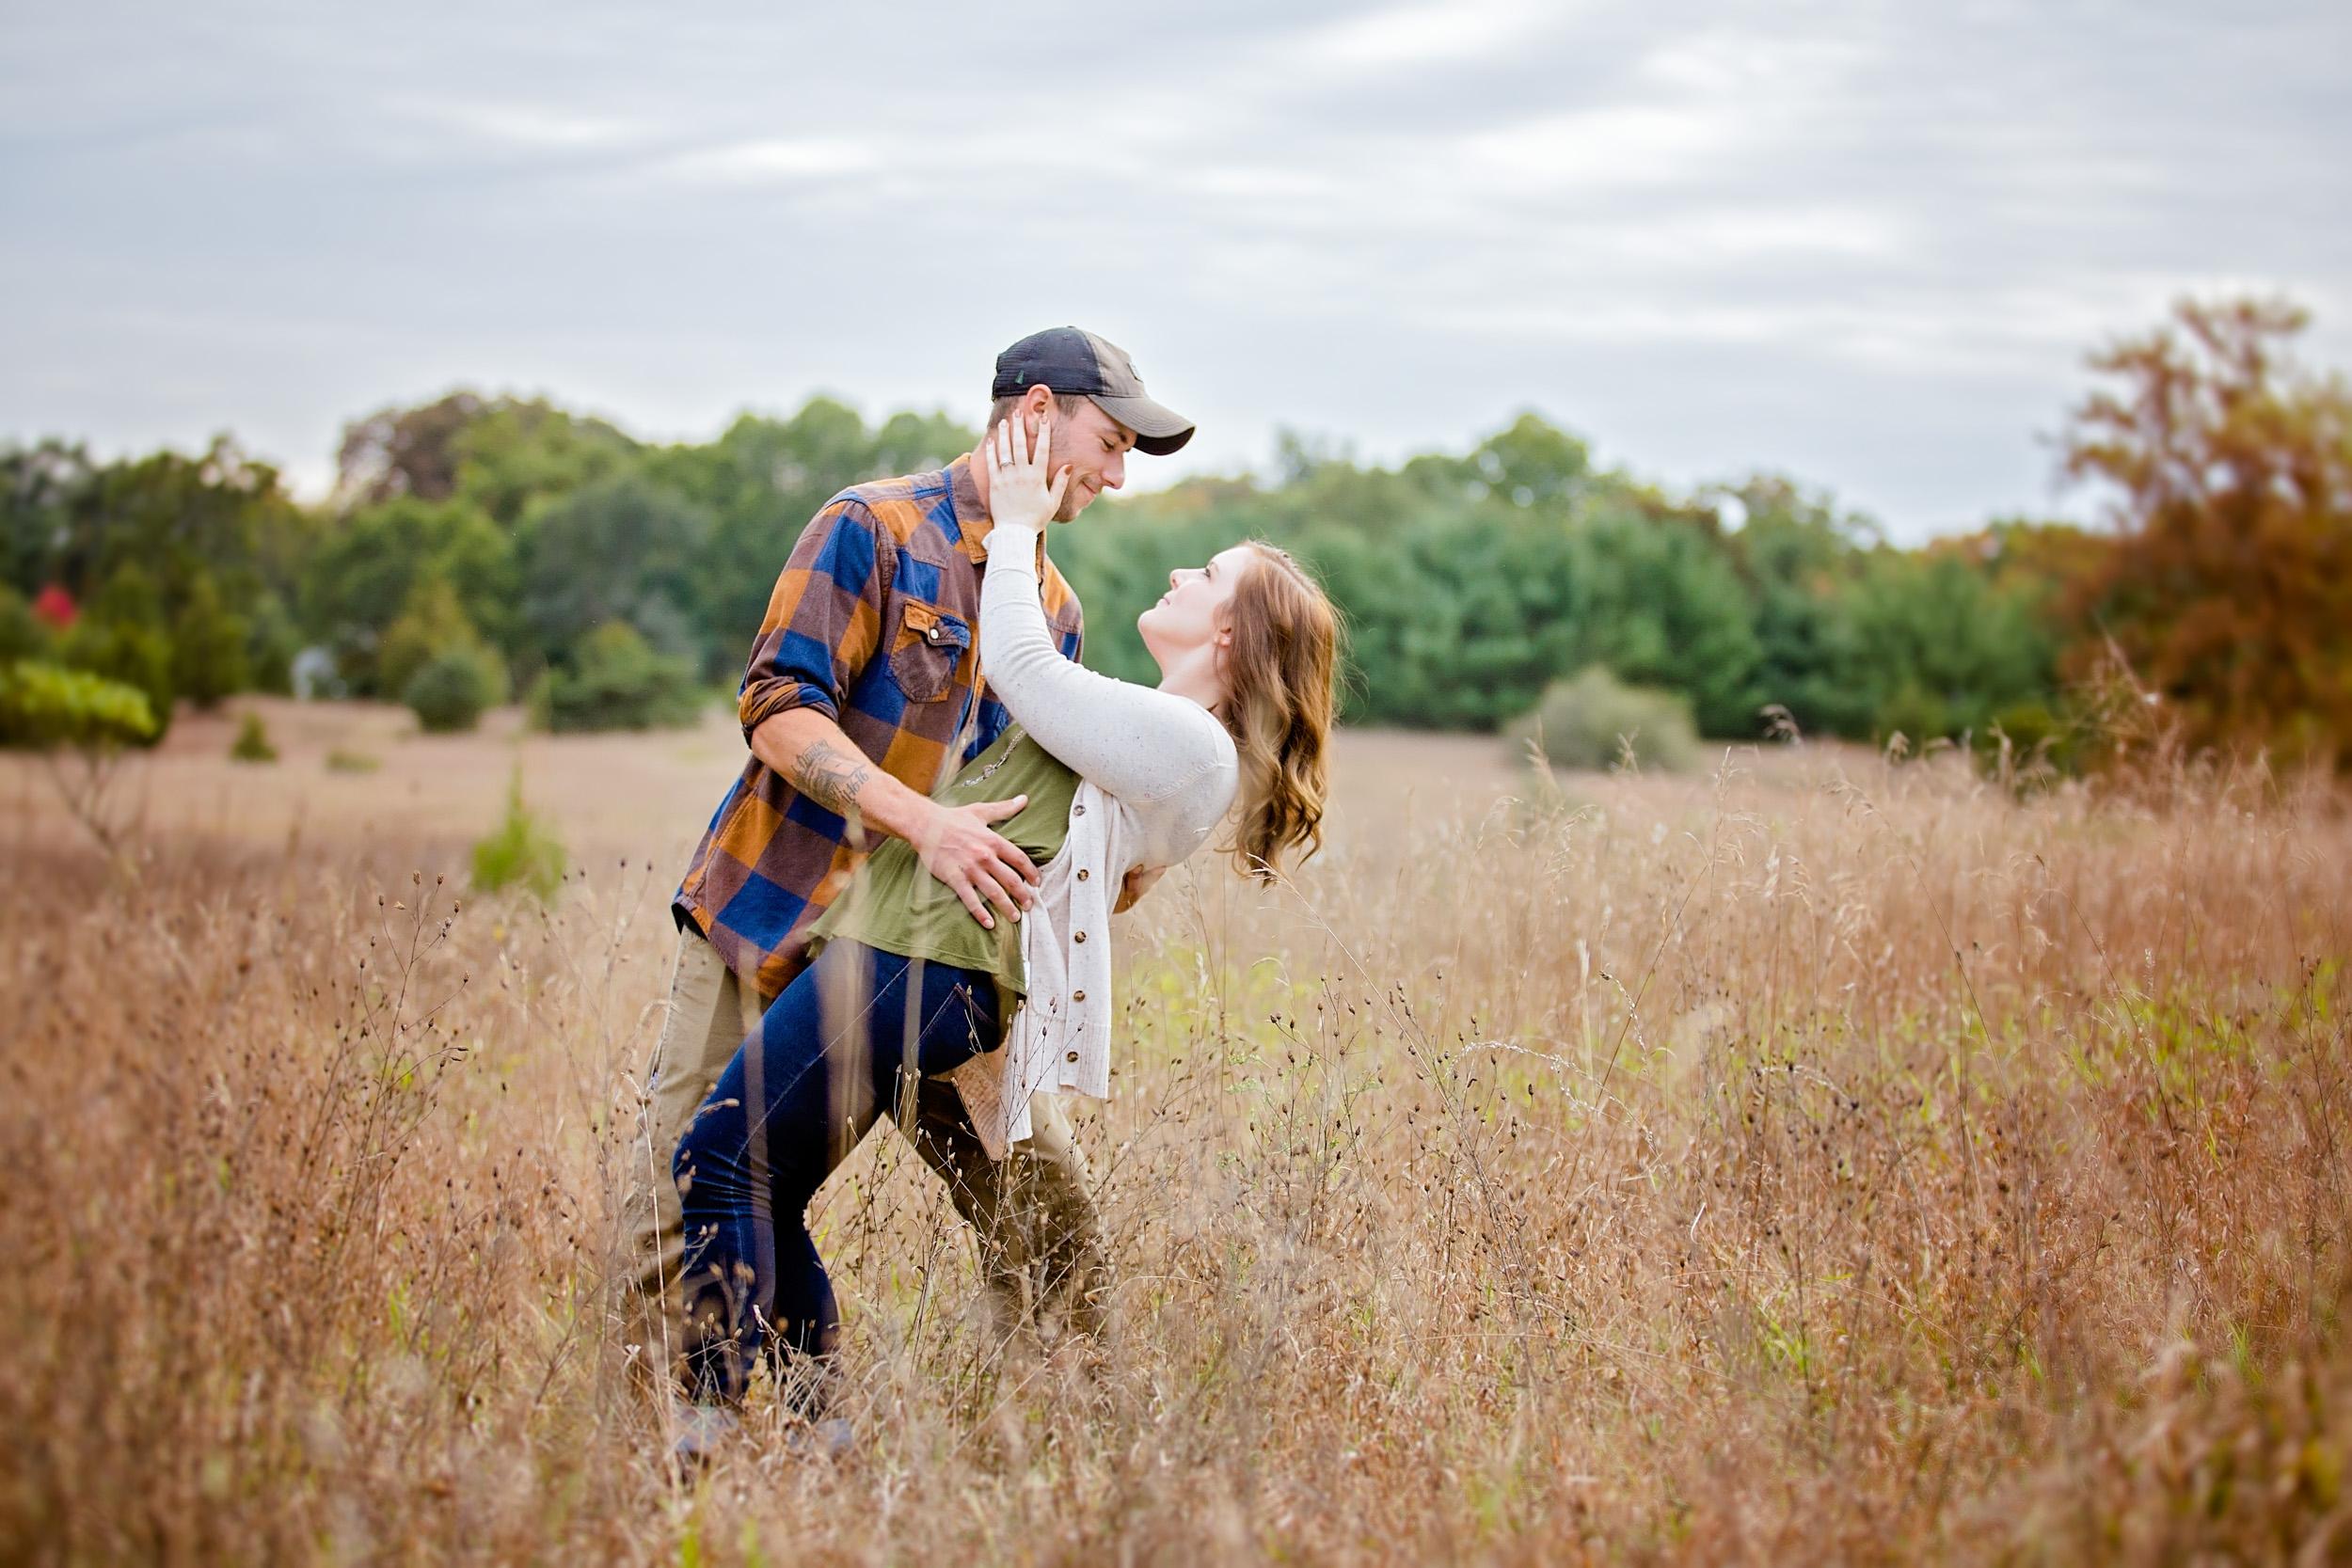 EngagementGallery-036.jpg